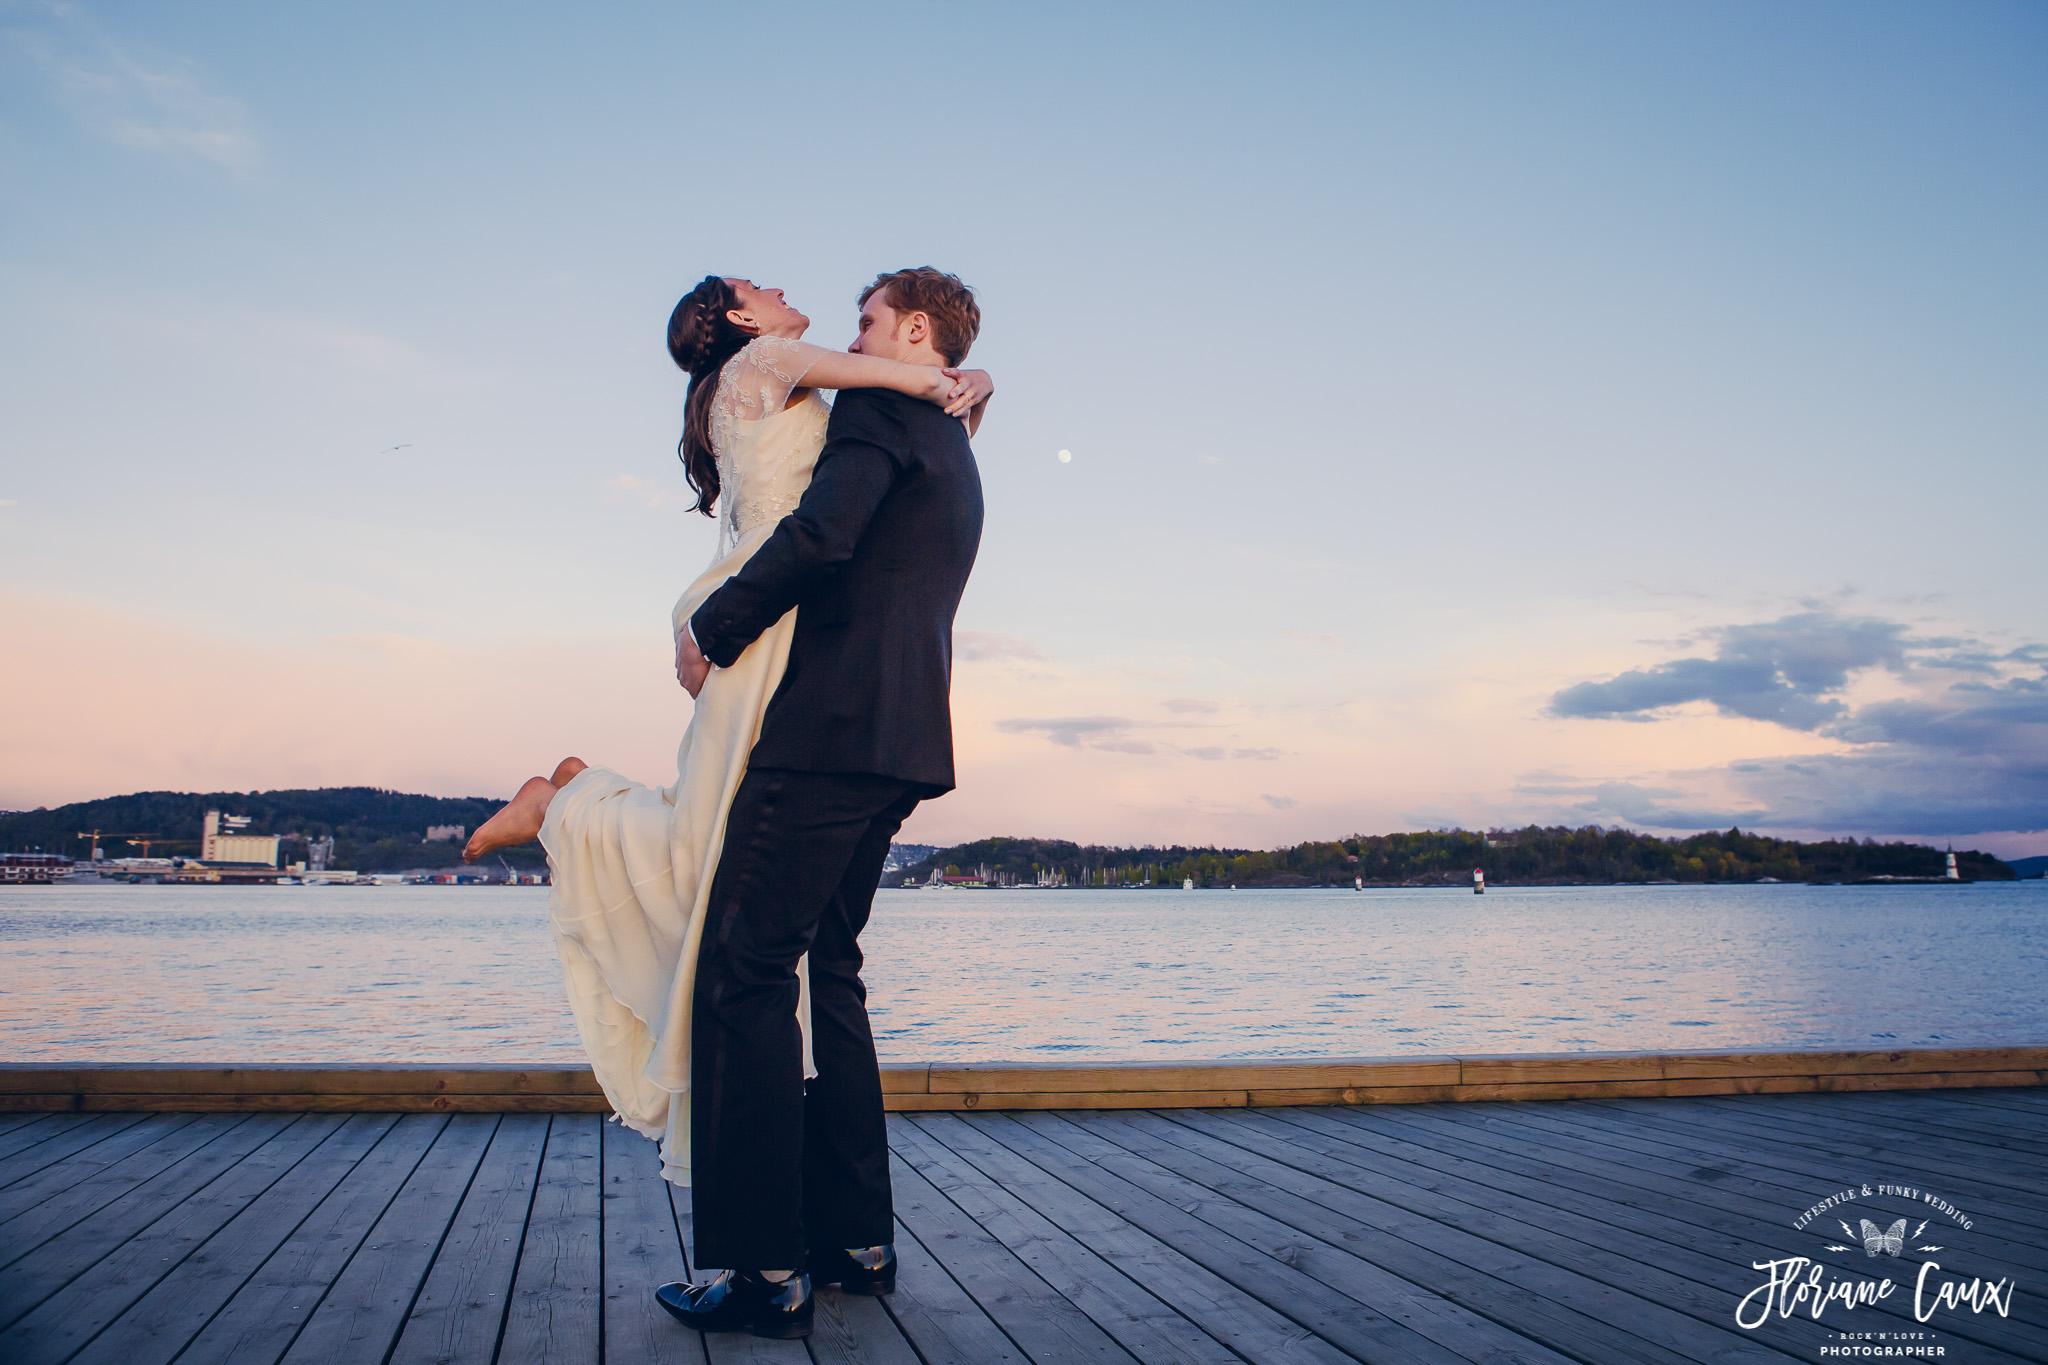 destination-wedding-photographer-oslo-norway-floriane-caux-45